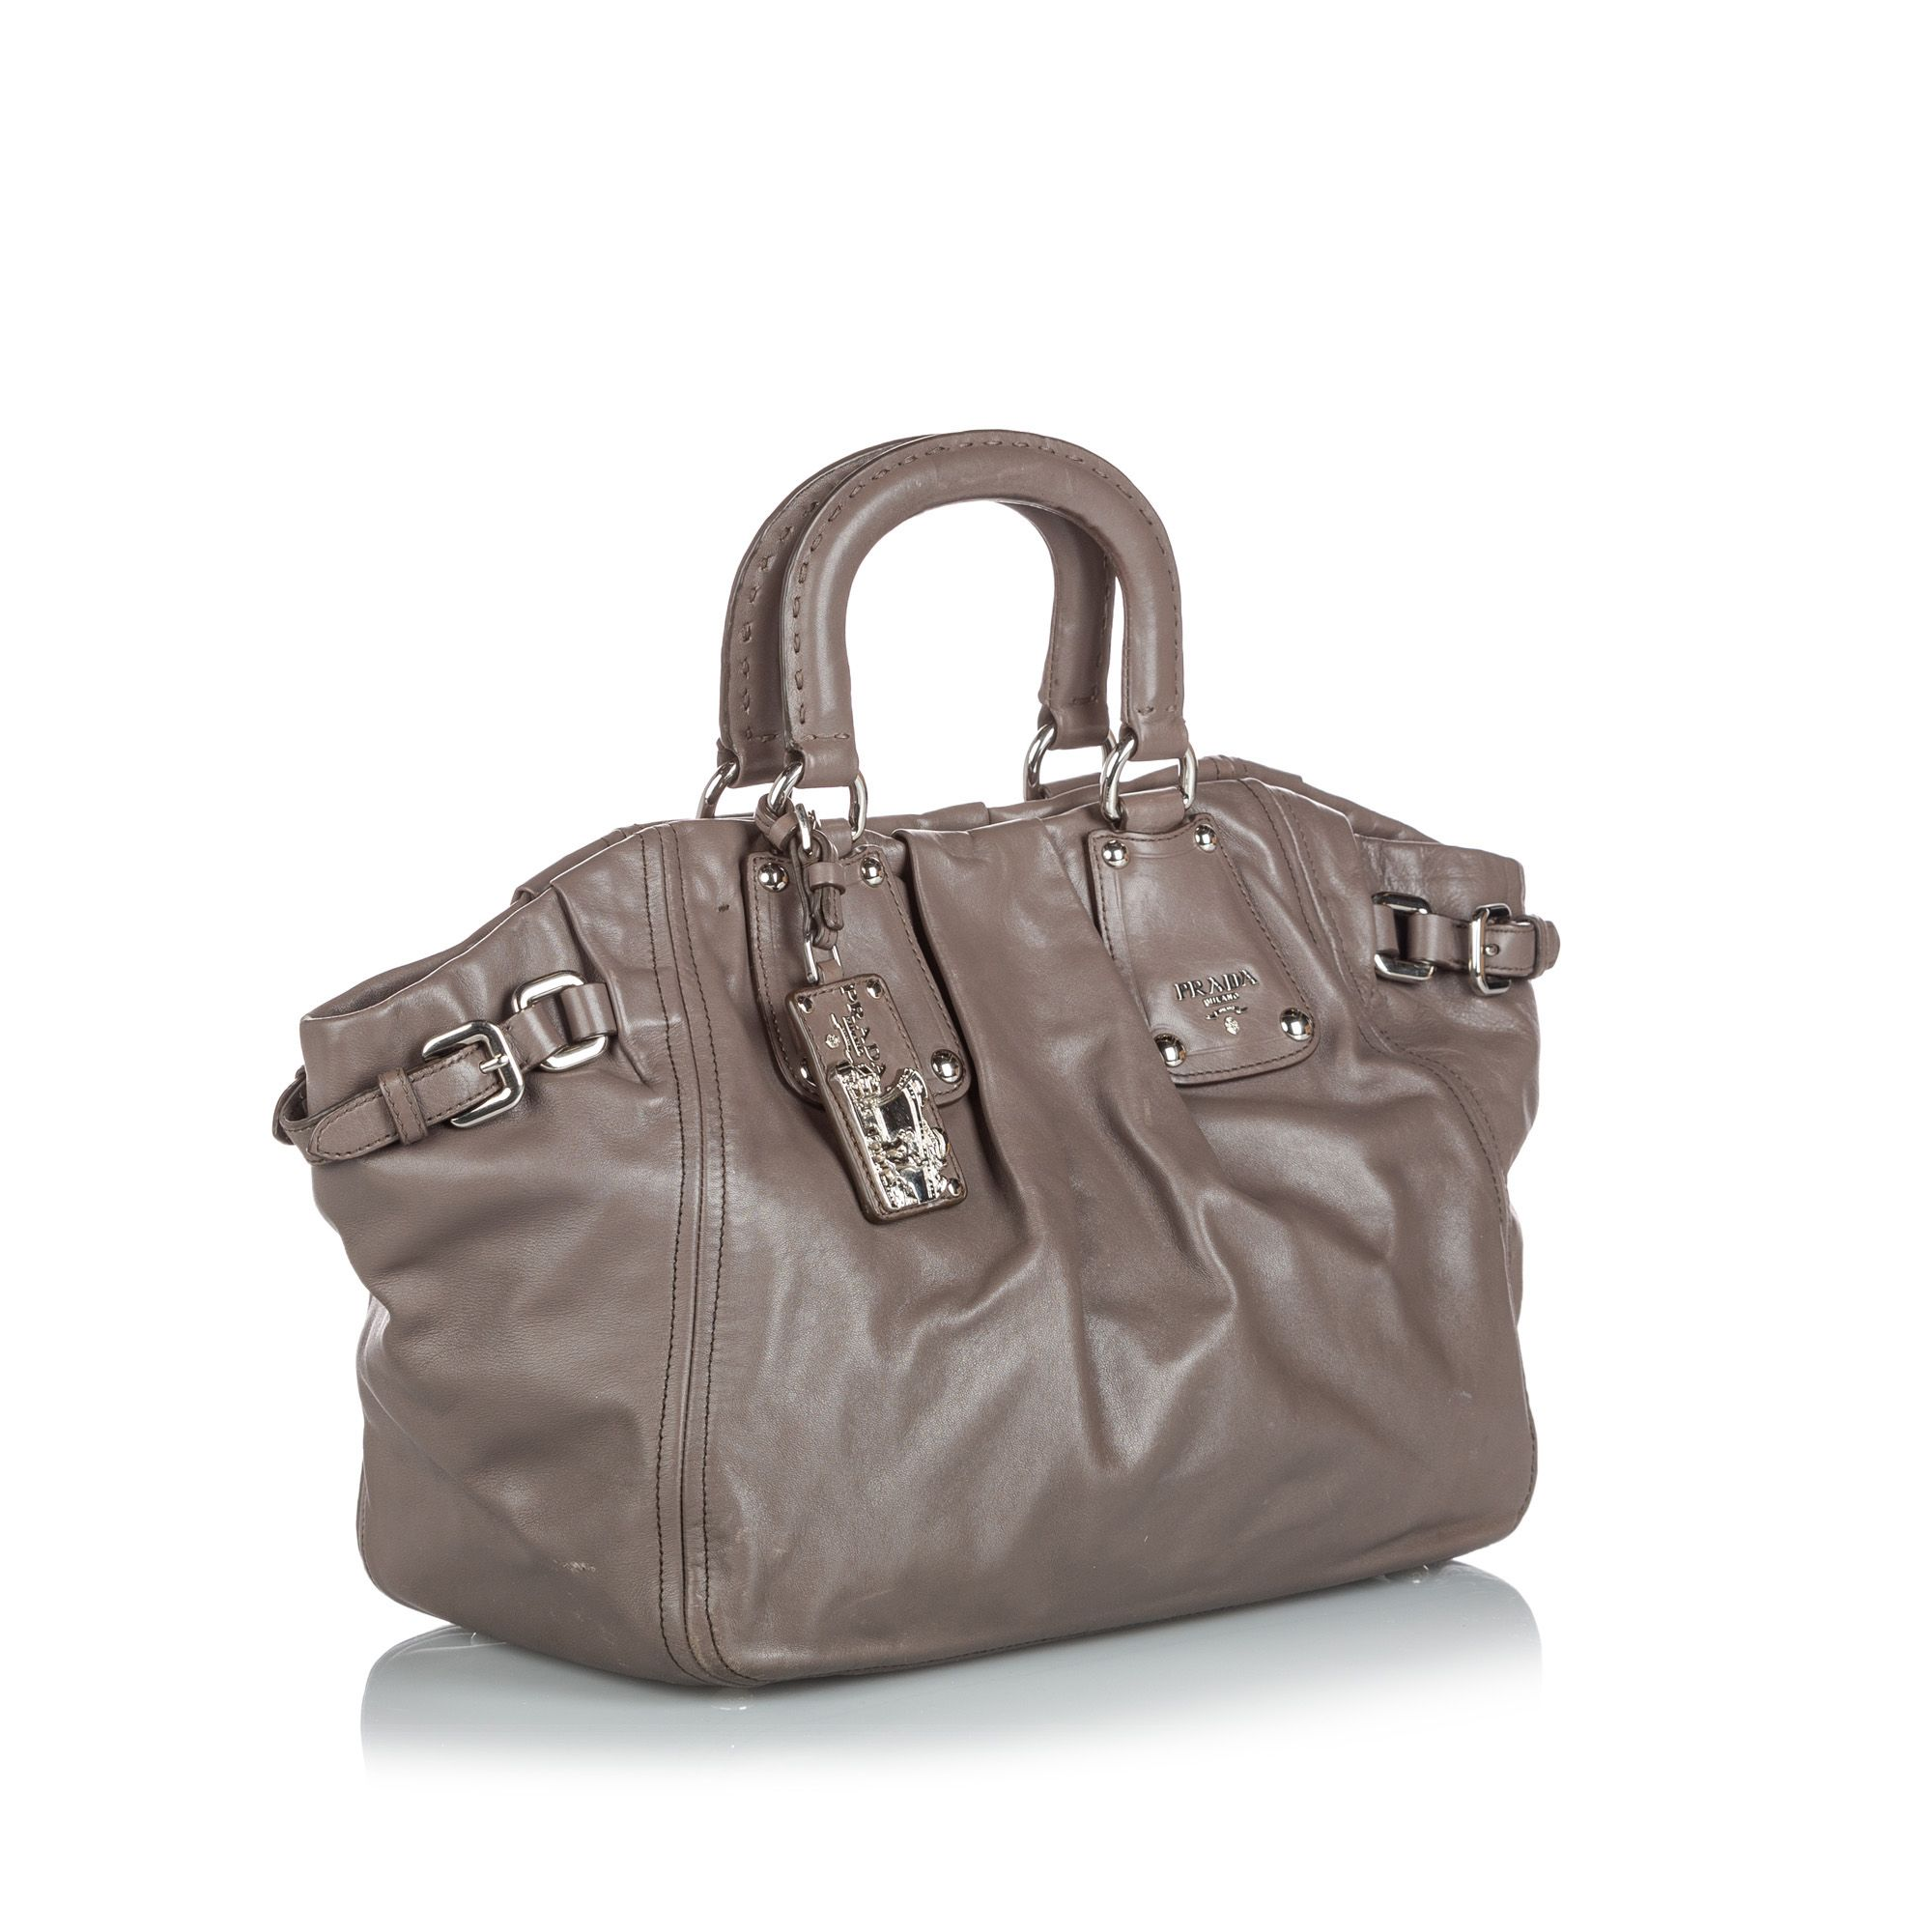 Vintage Prada Leather Satchel Gray